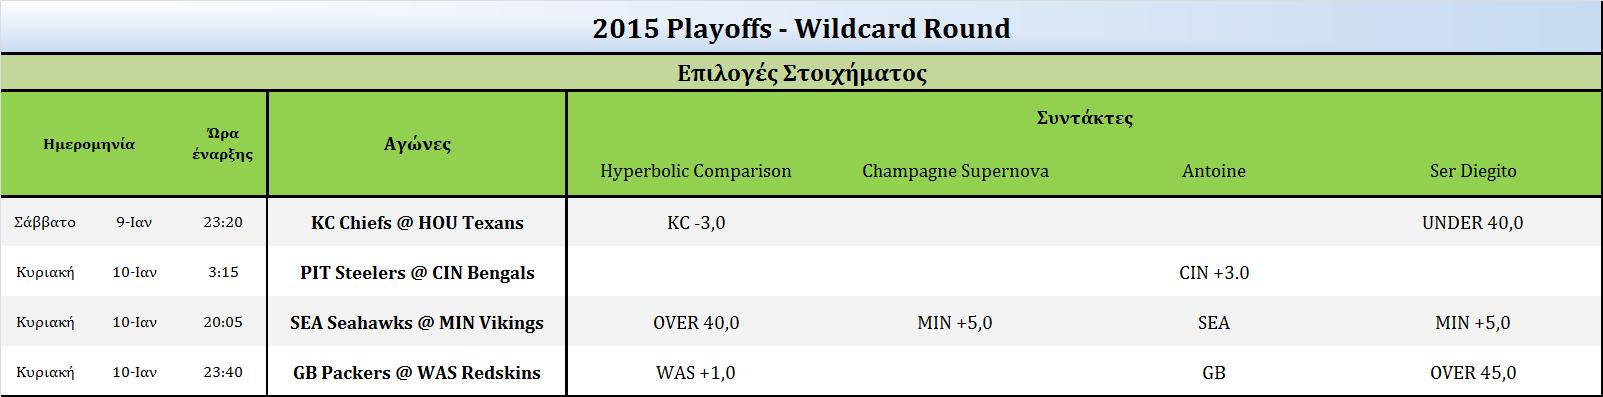 wildcard week 2015 bets